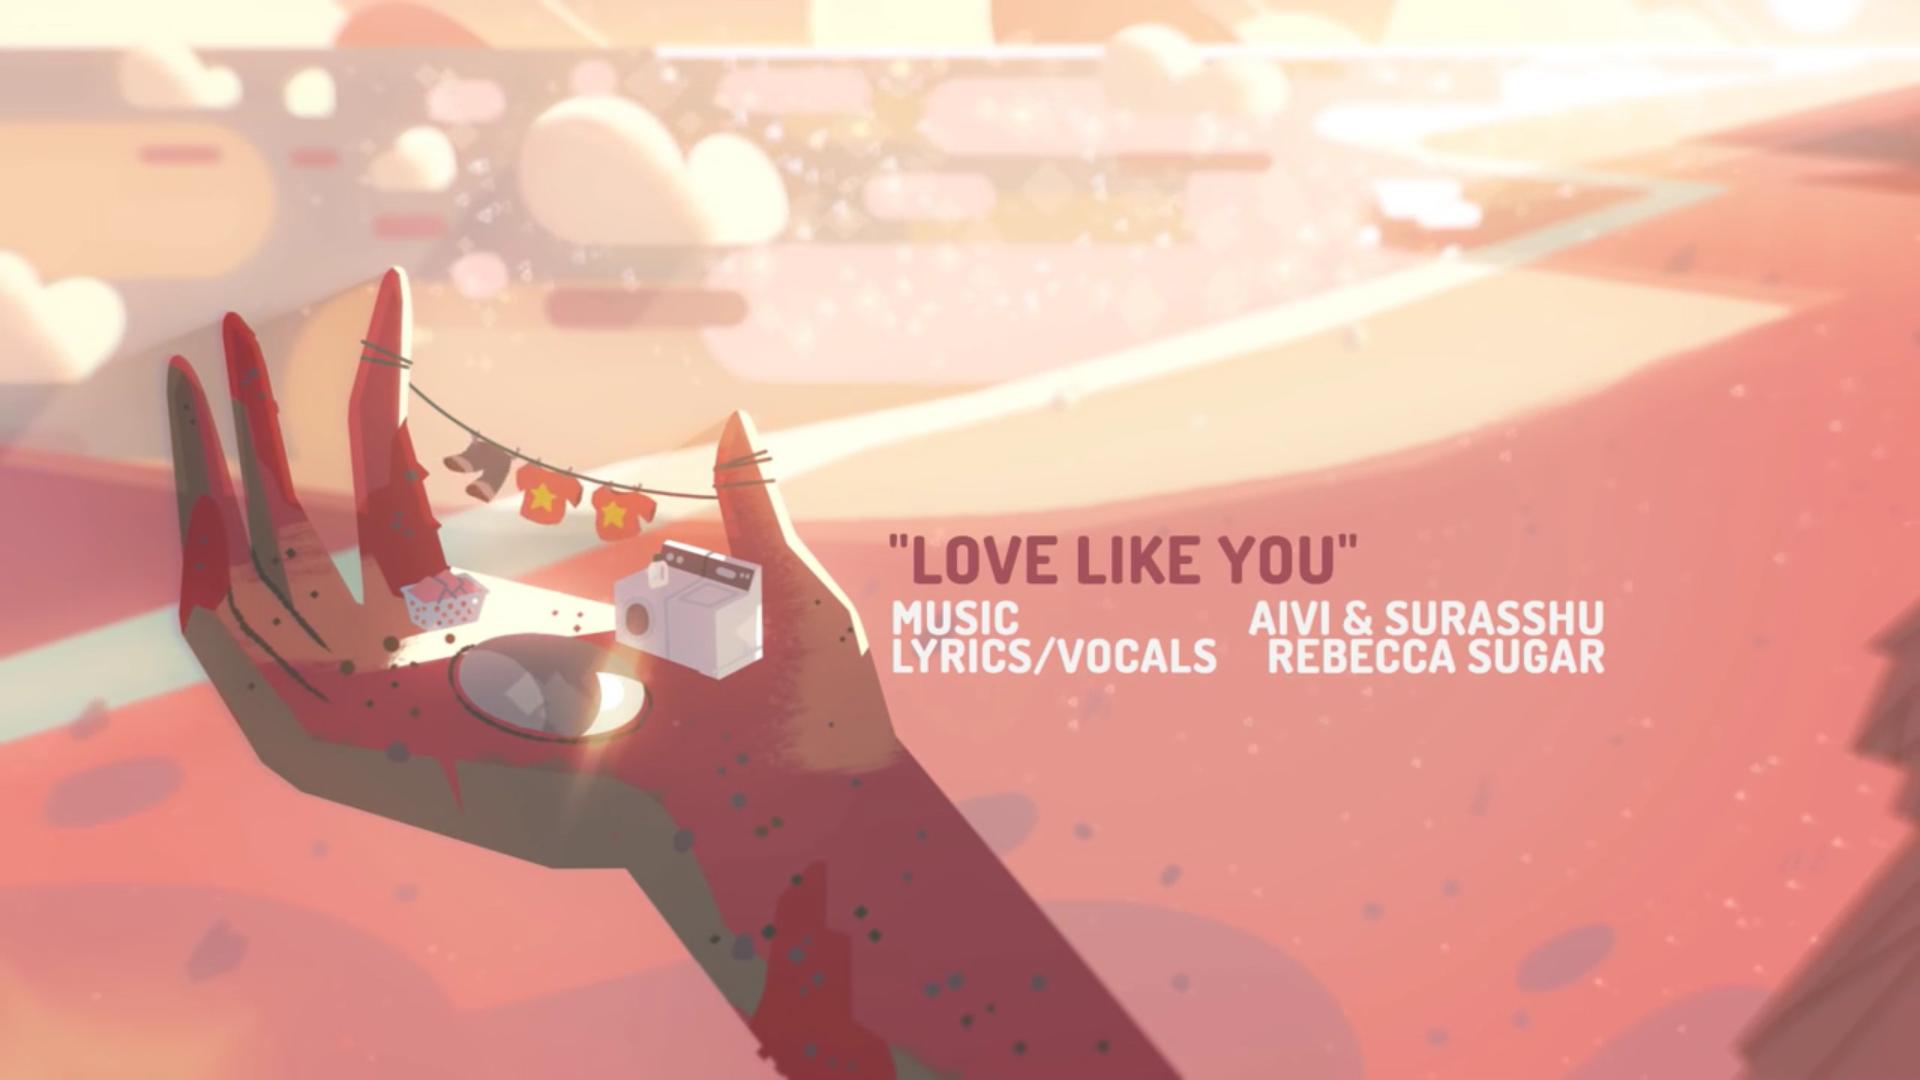 flirting games romance videos 2017 list songs